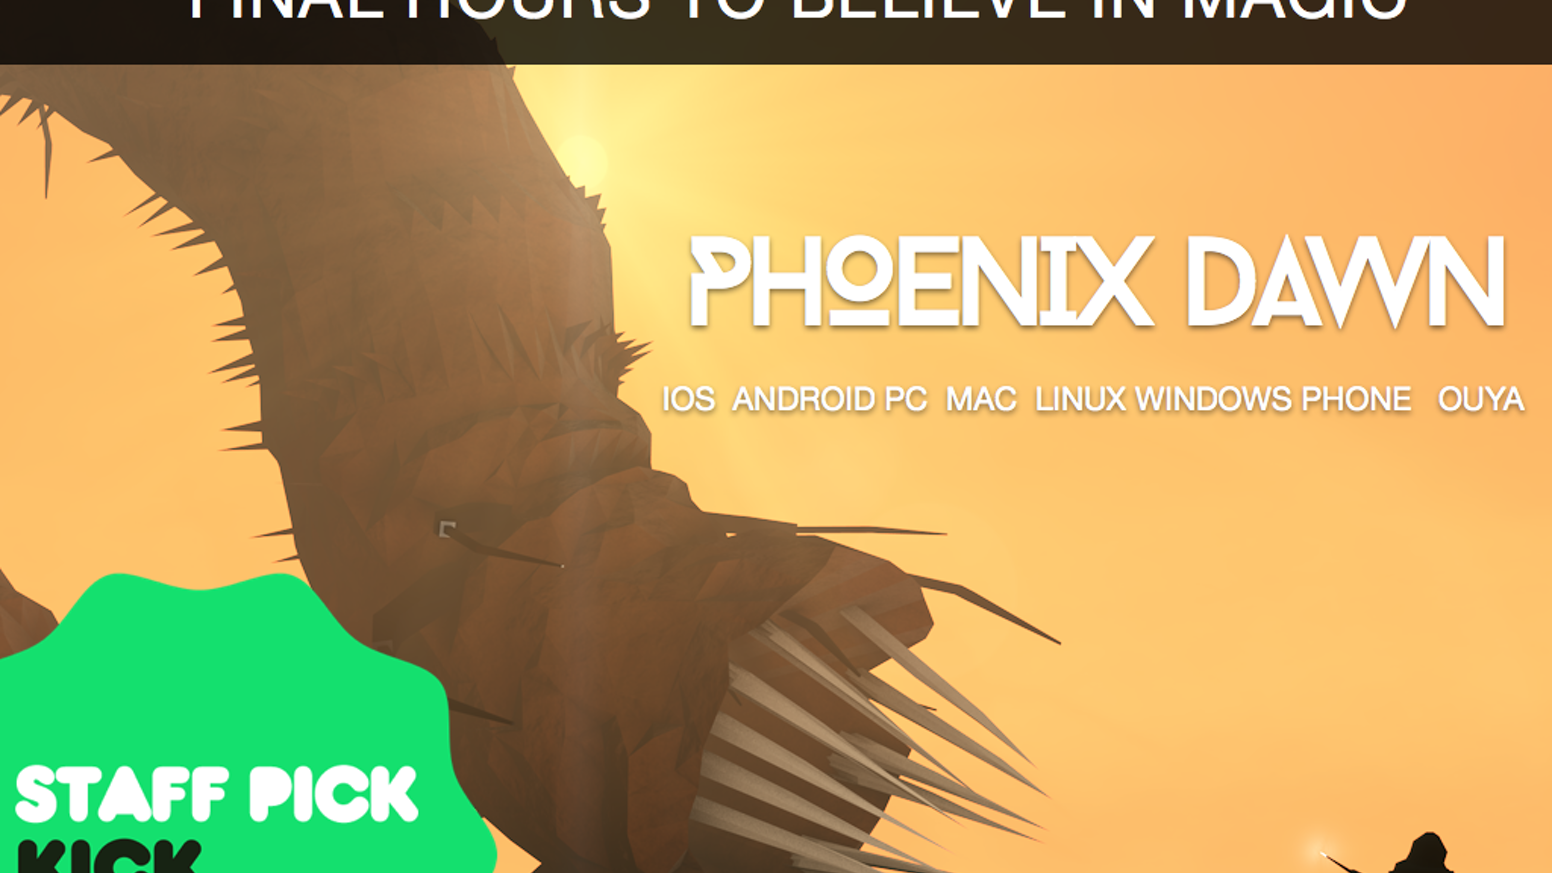 Phoenix Dawn by Eric Trowbridge » Live Twitch Feed of Game